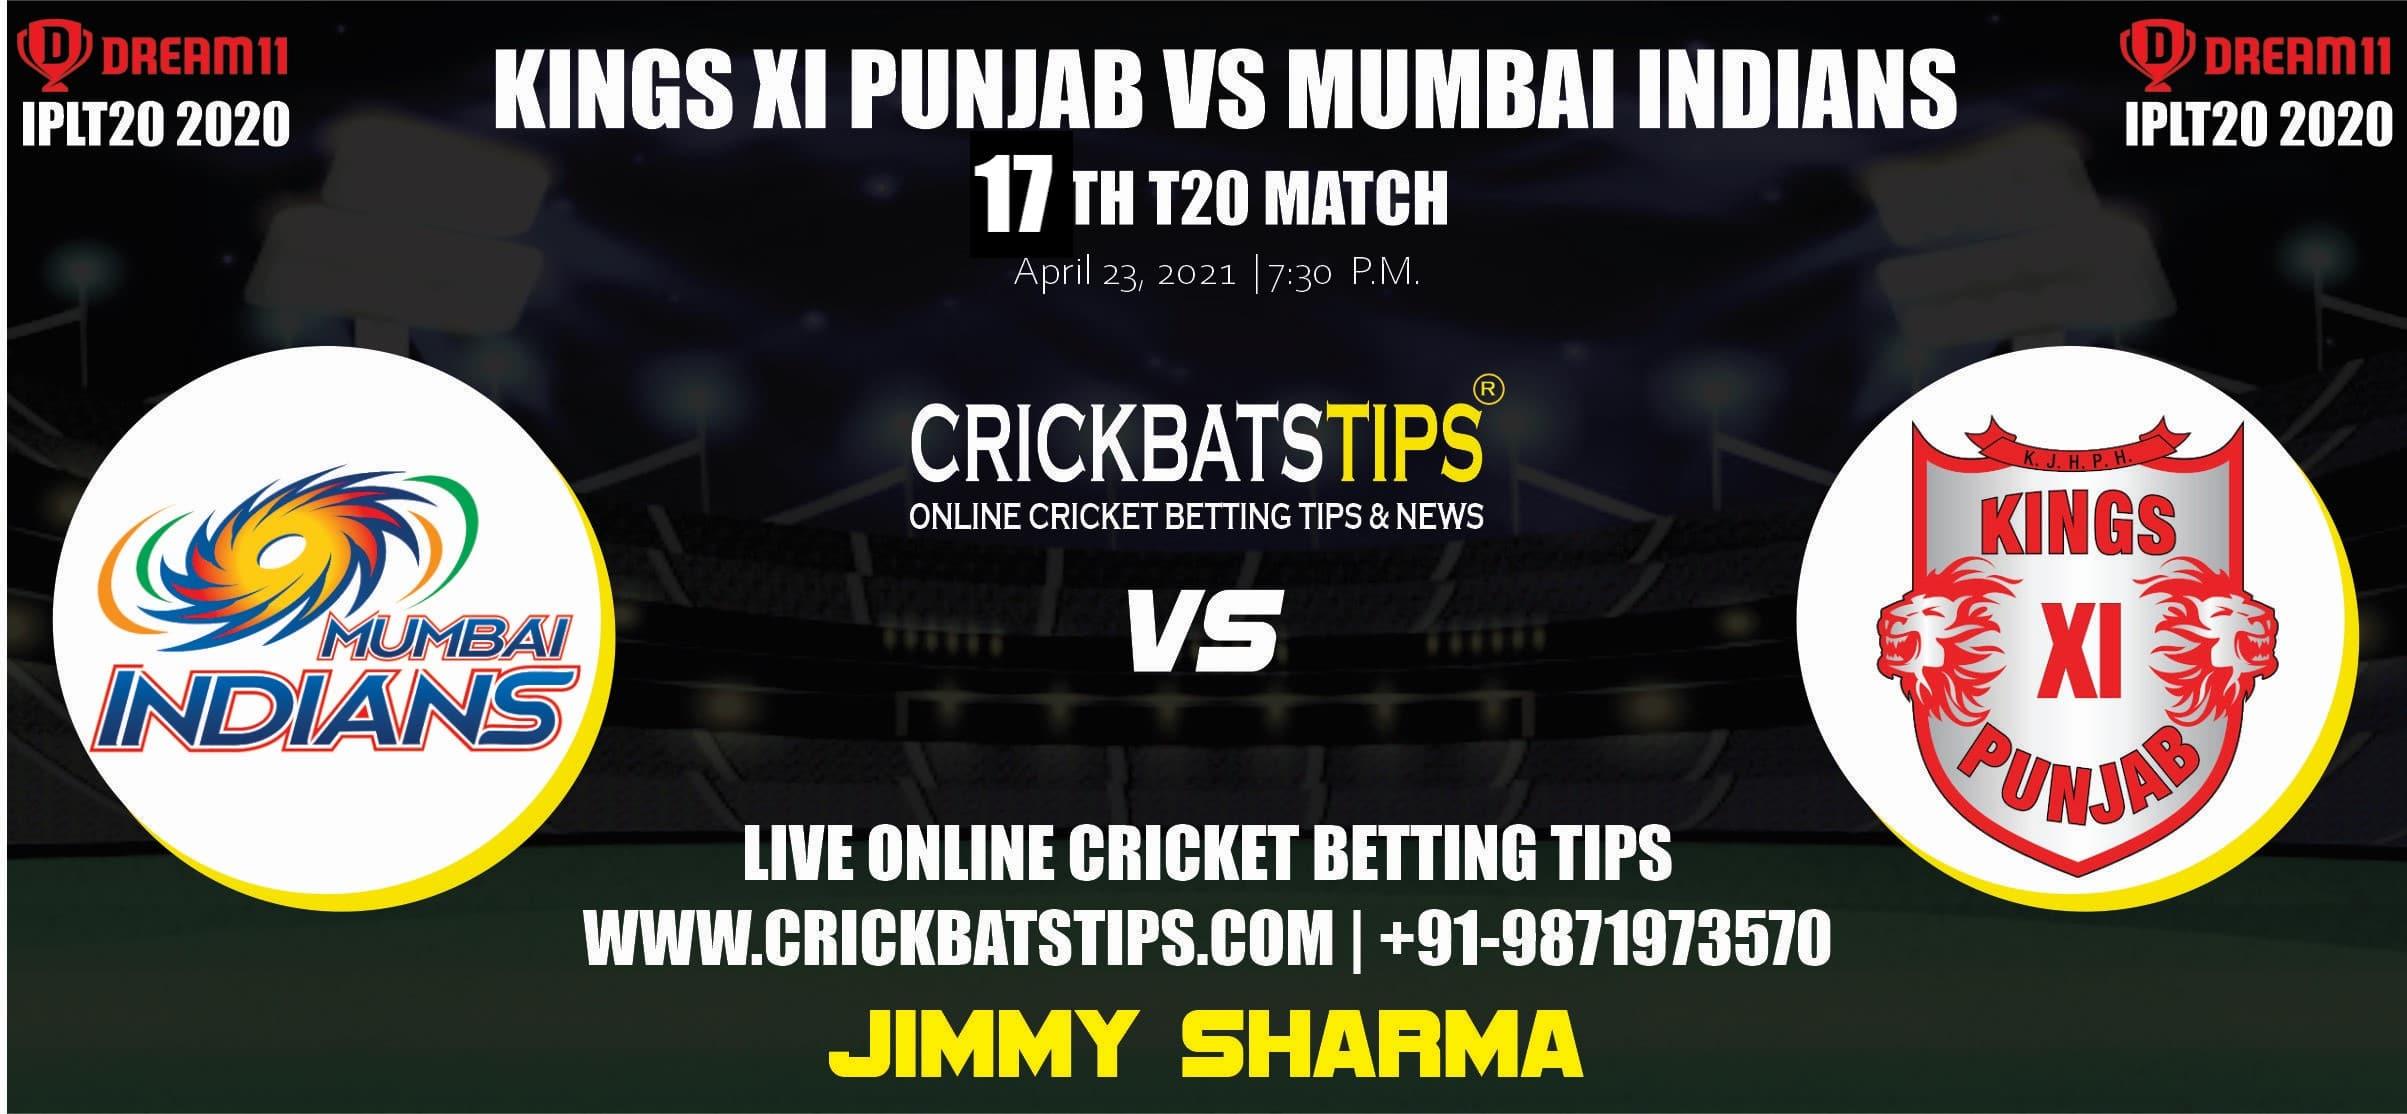 Kings-XI-Punjab-vs-Mumbai-Indians-MIvKXIP-MIvsKXIP-KXIPvMI-KXIPvsMI-Mumbai-Indians-vs-Kings-XI-Punjab-IPL-2021